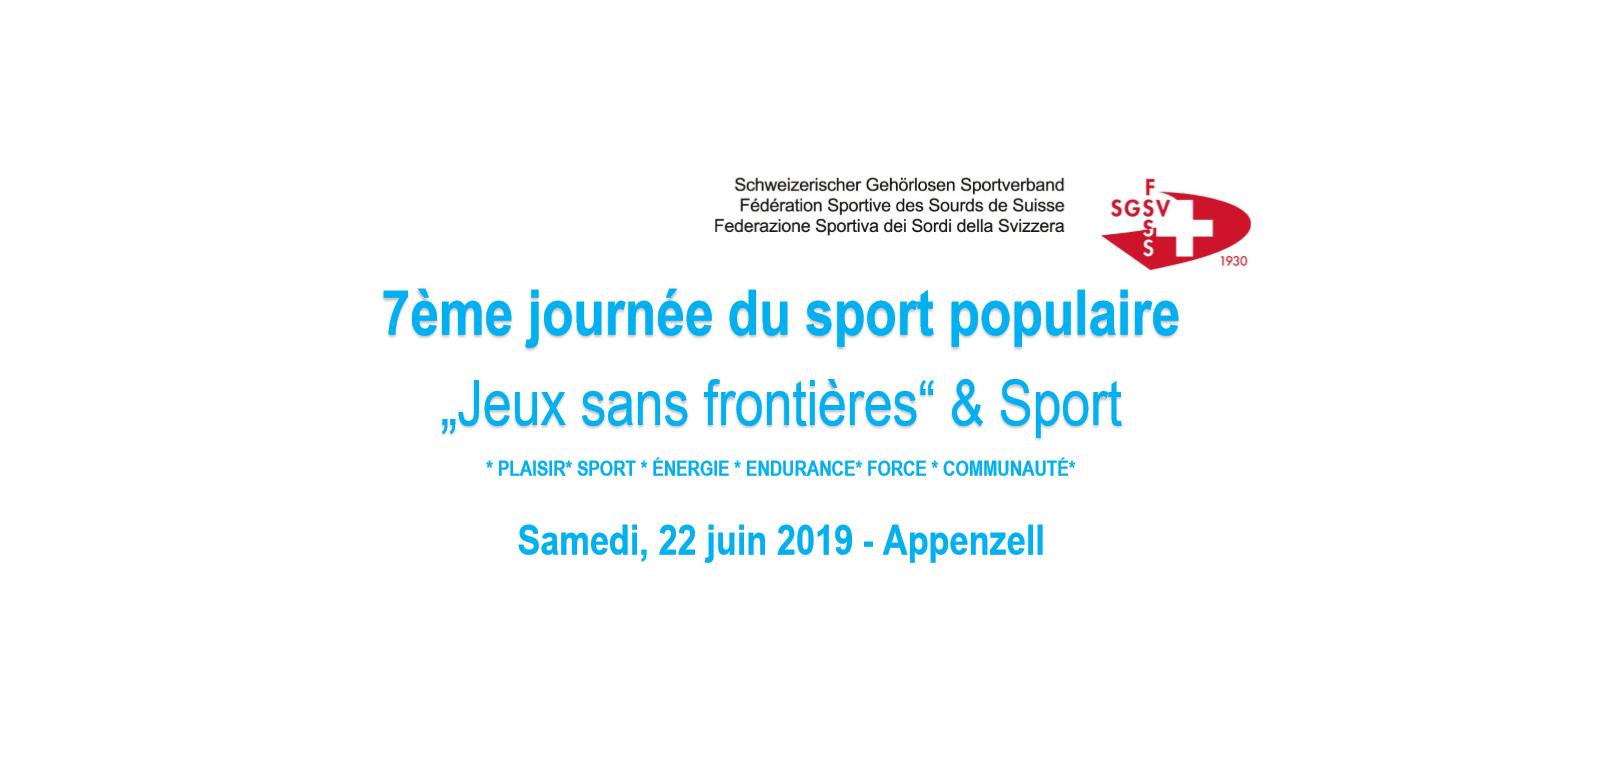 7éme journée du sport populair - FSSS